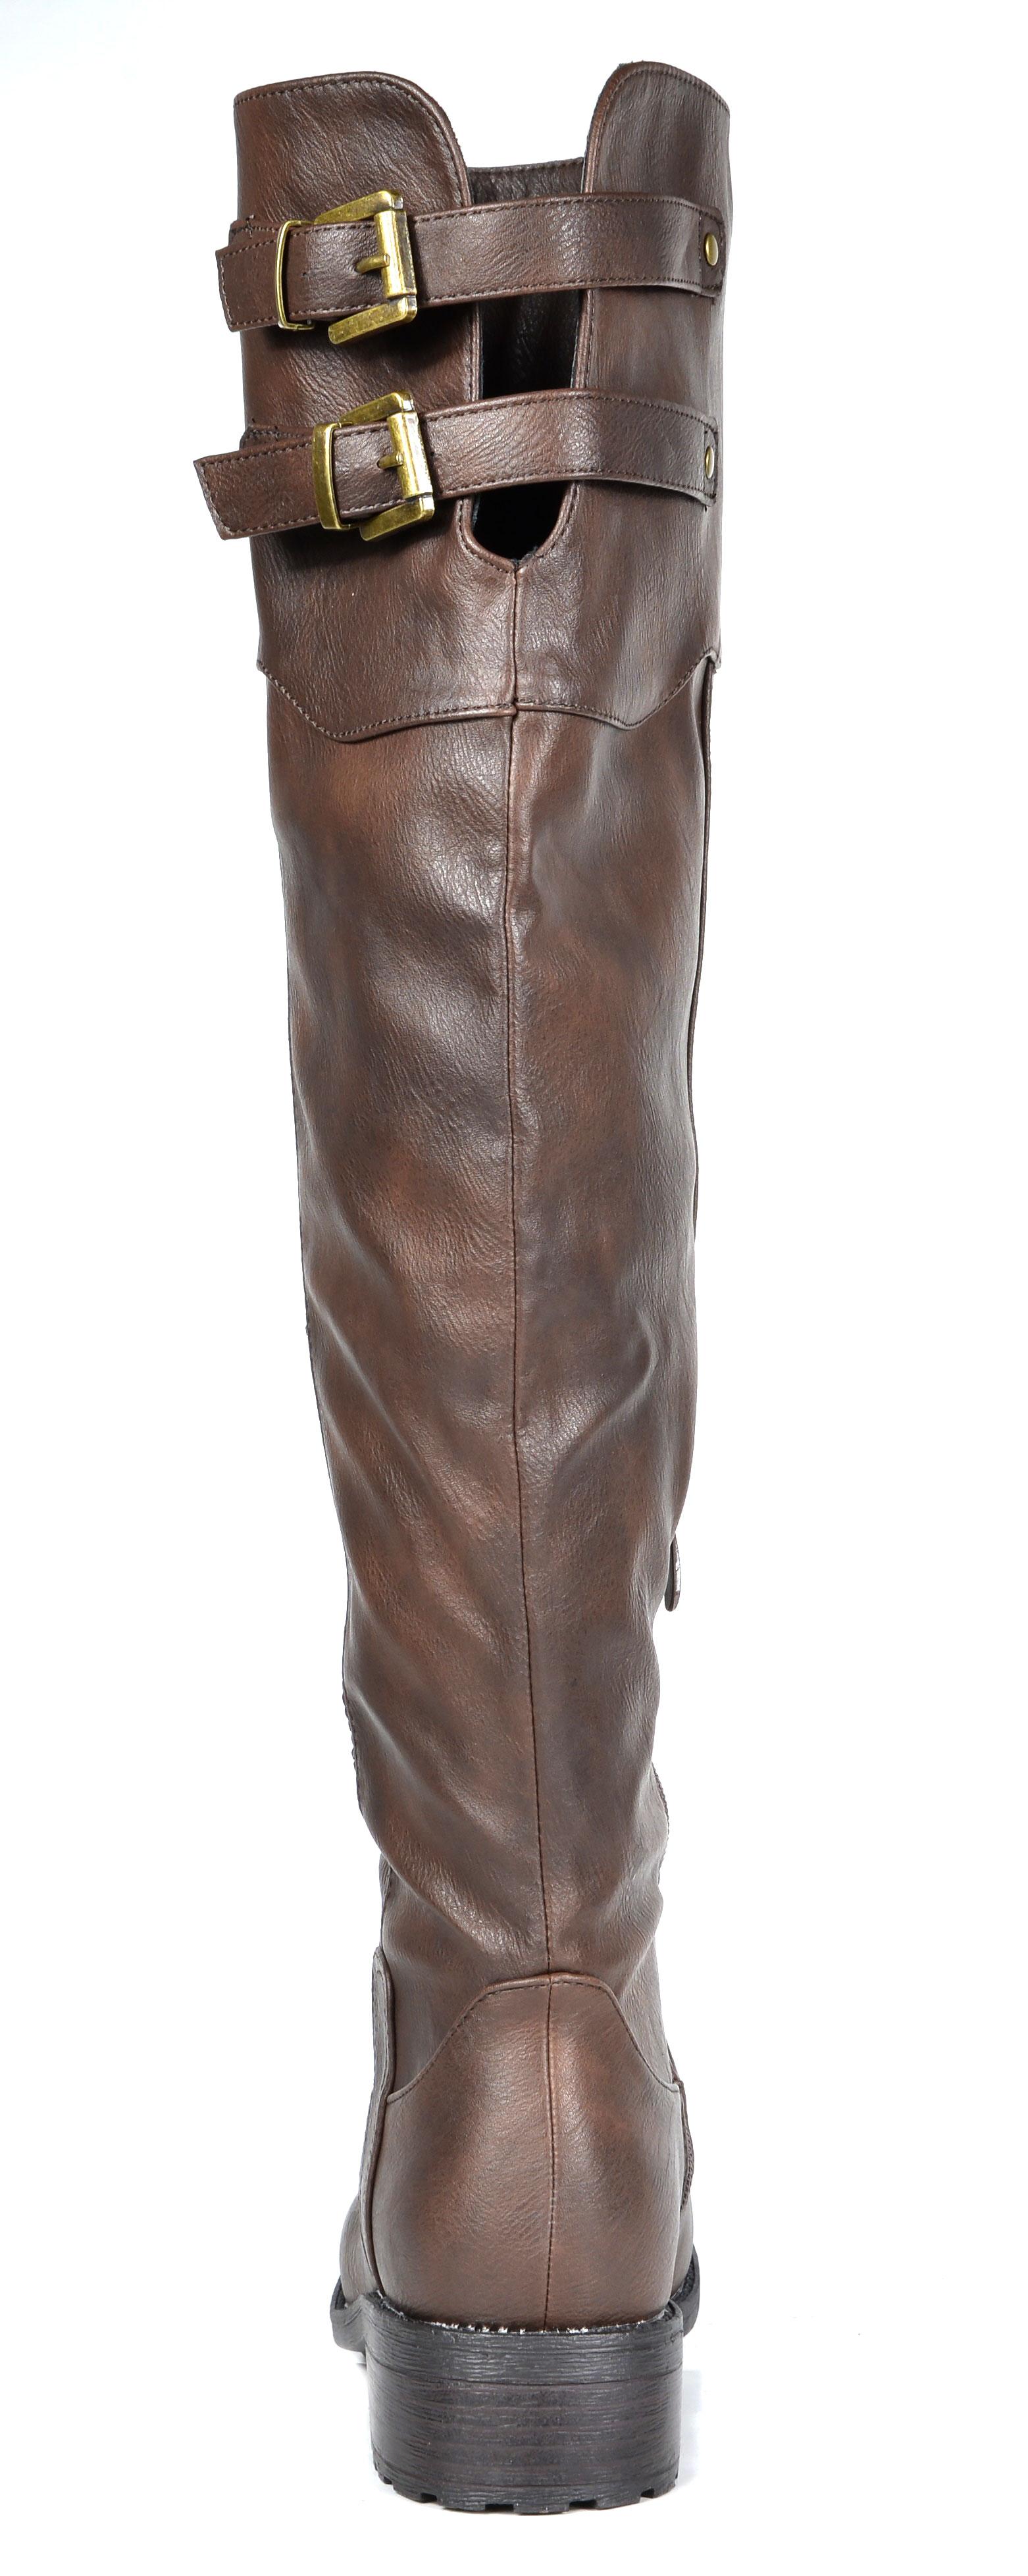 f8cb7751deb DREAM PAIRS Women s Knee High Military Combat Boots (WIDE CALF ...